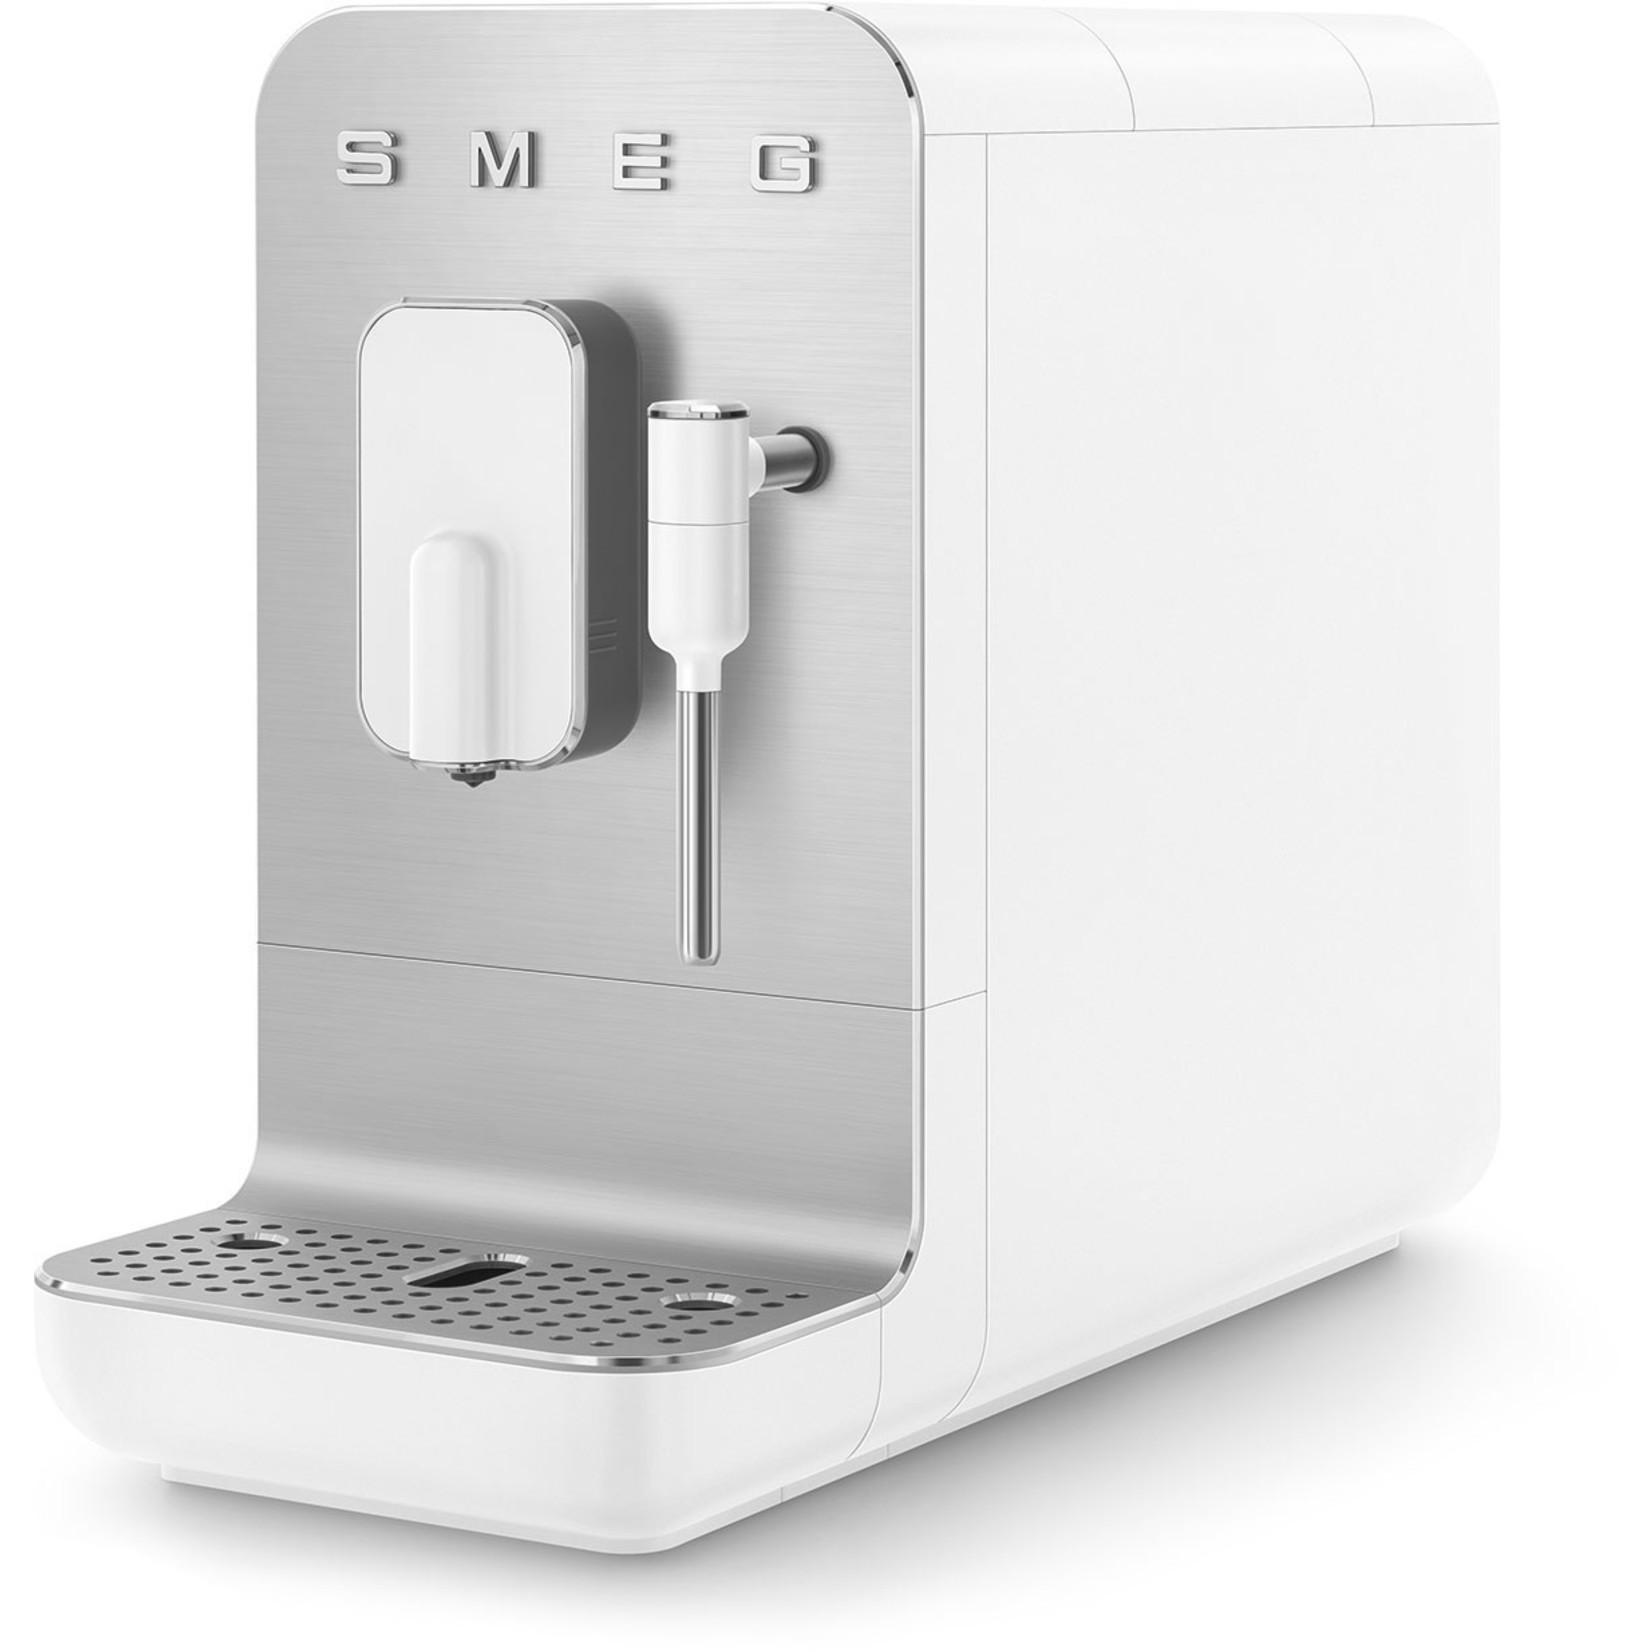 Smeg Smeg espressomachine medium, mat wit, met stoomfunctie